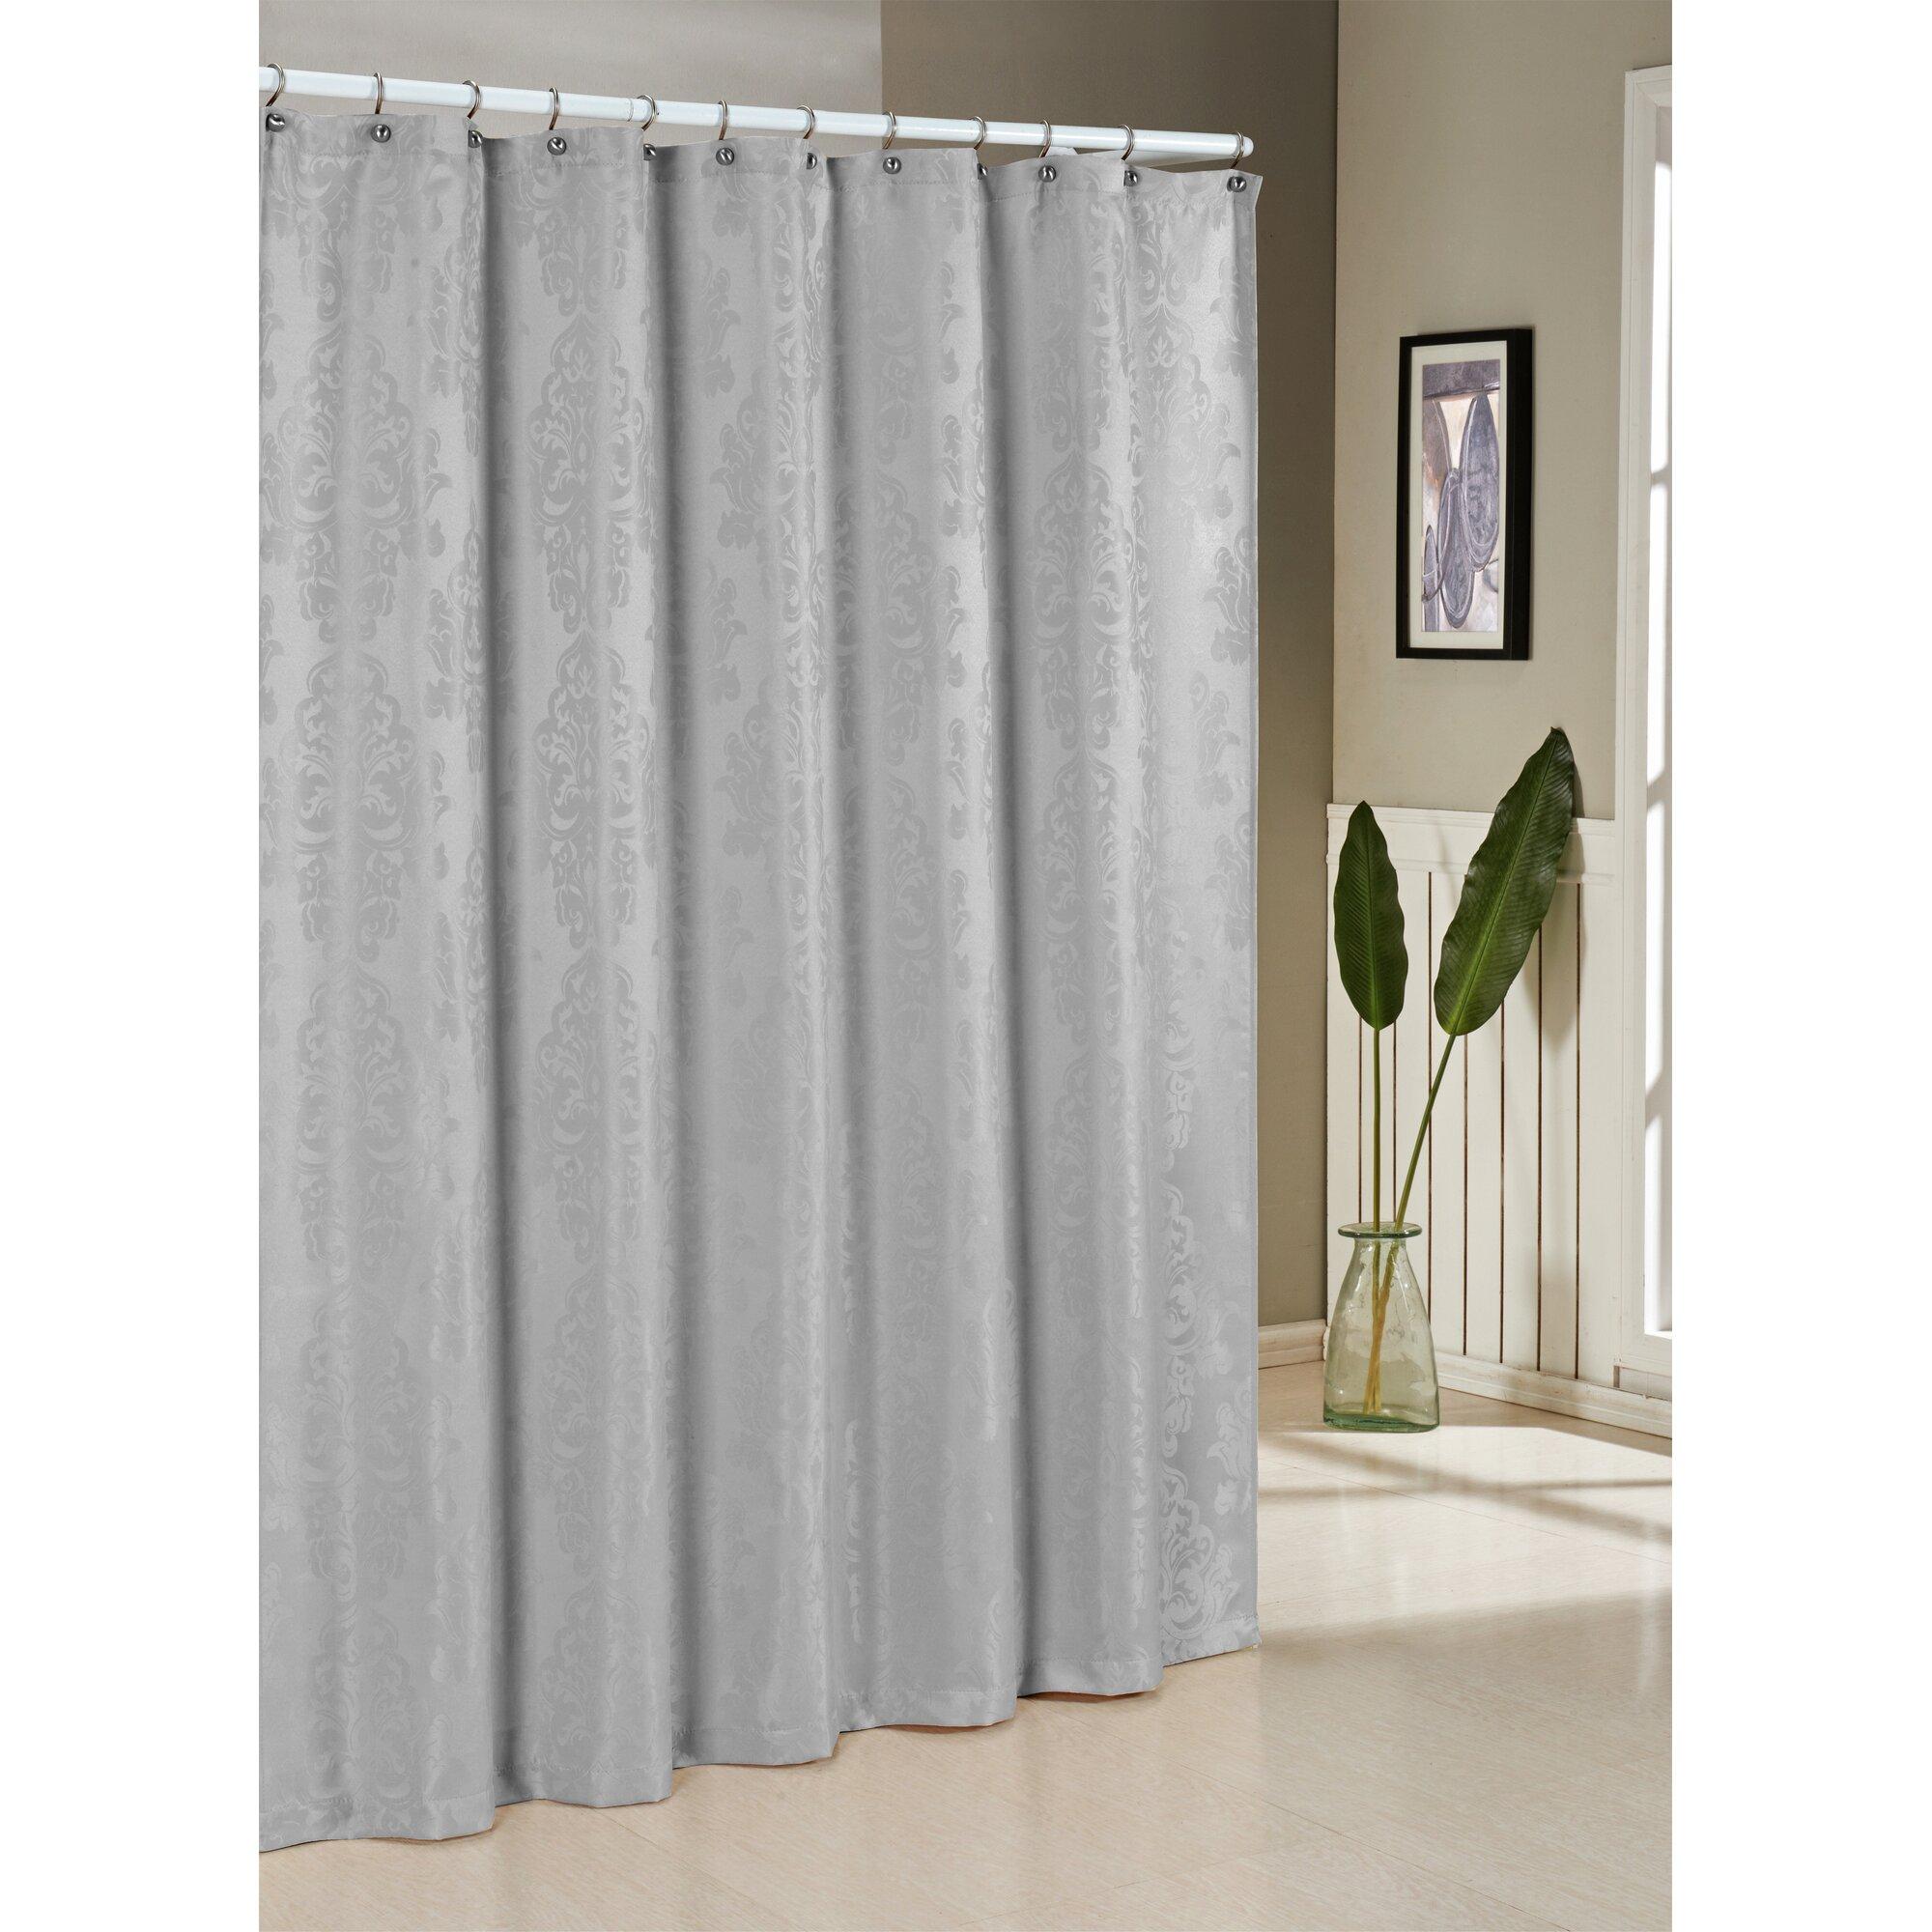 DR International Parson Jacquard Shower Curtain  Reviews Wayfair - Beige and gray shower curtain